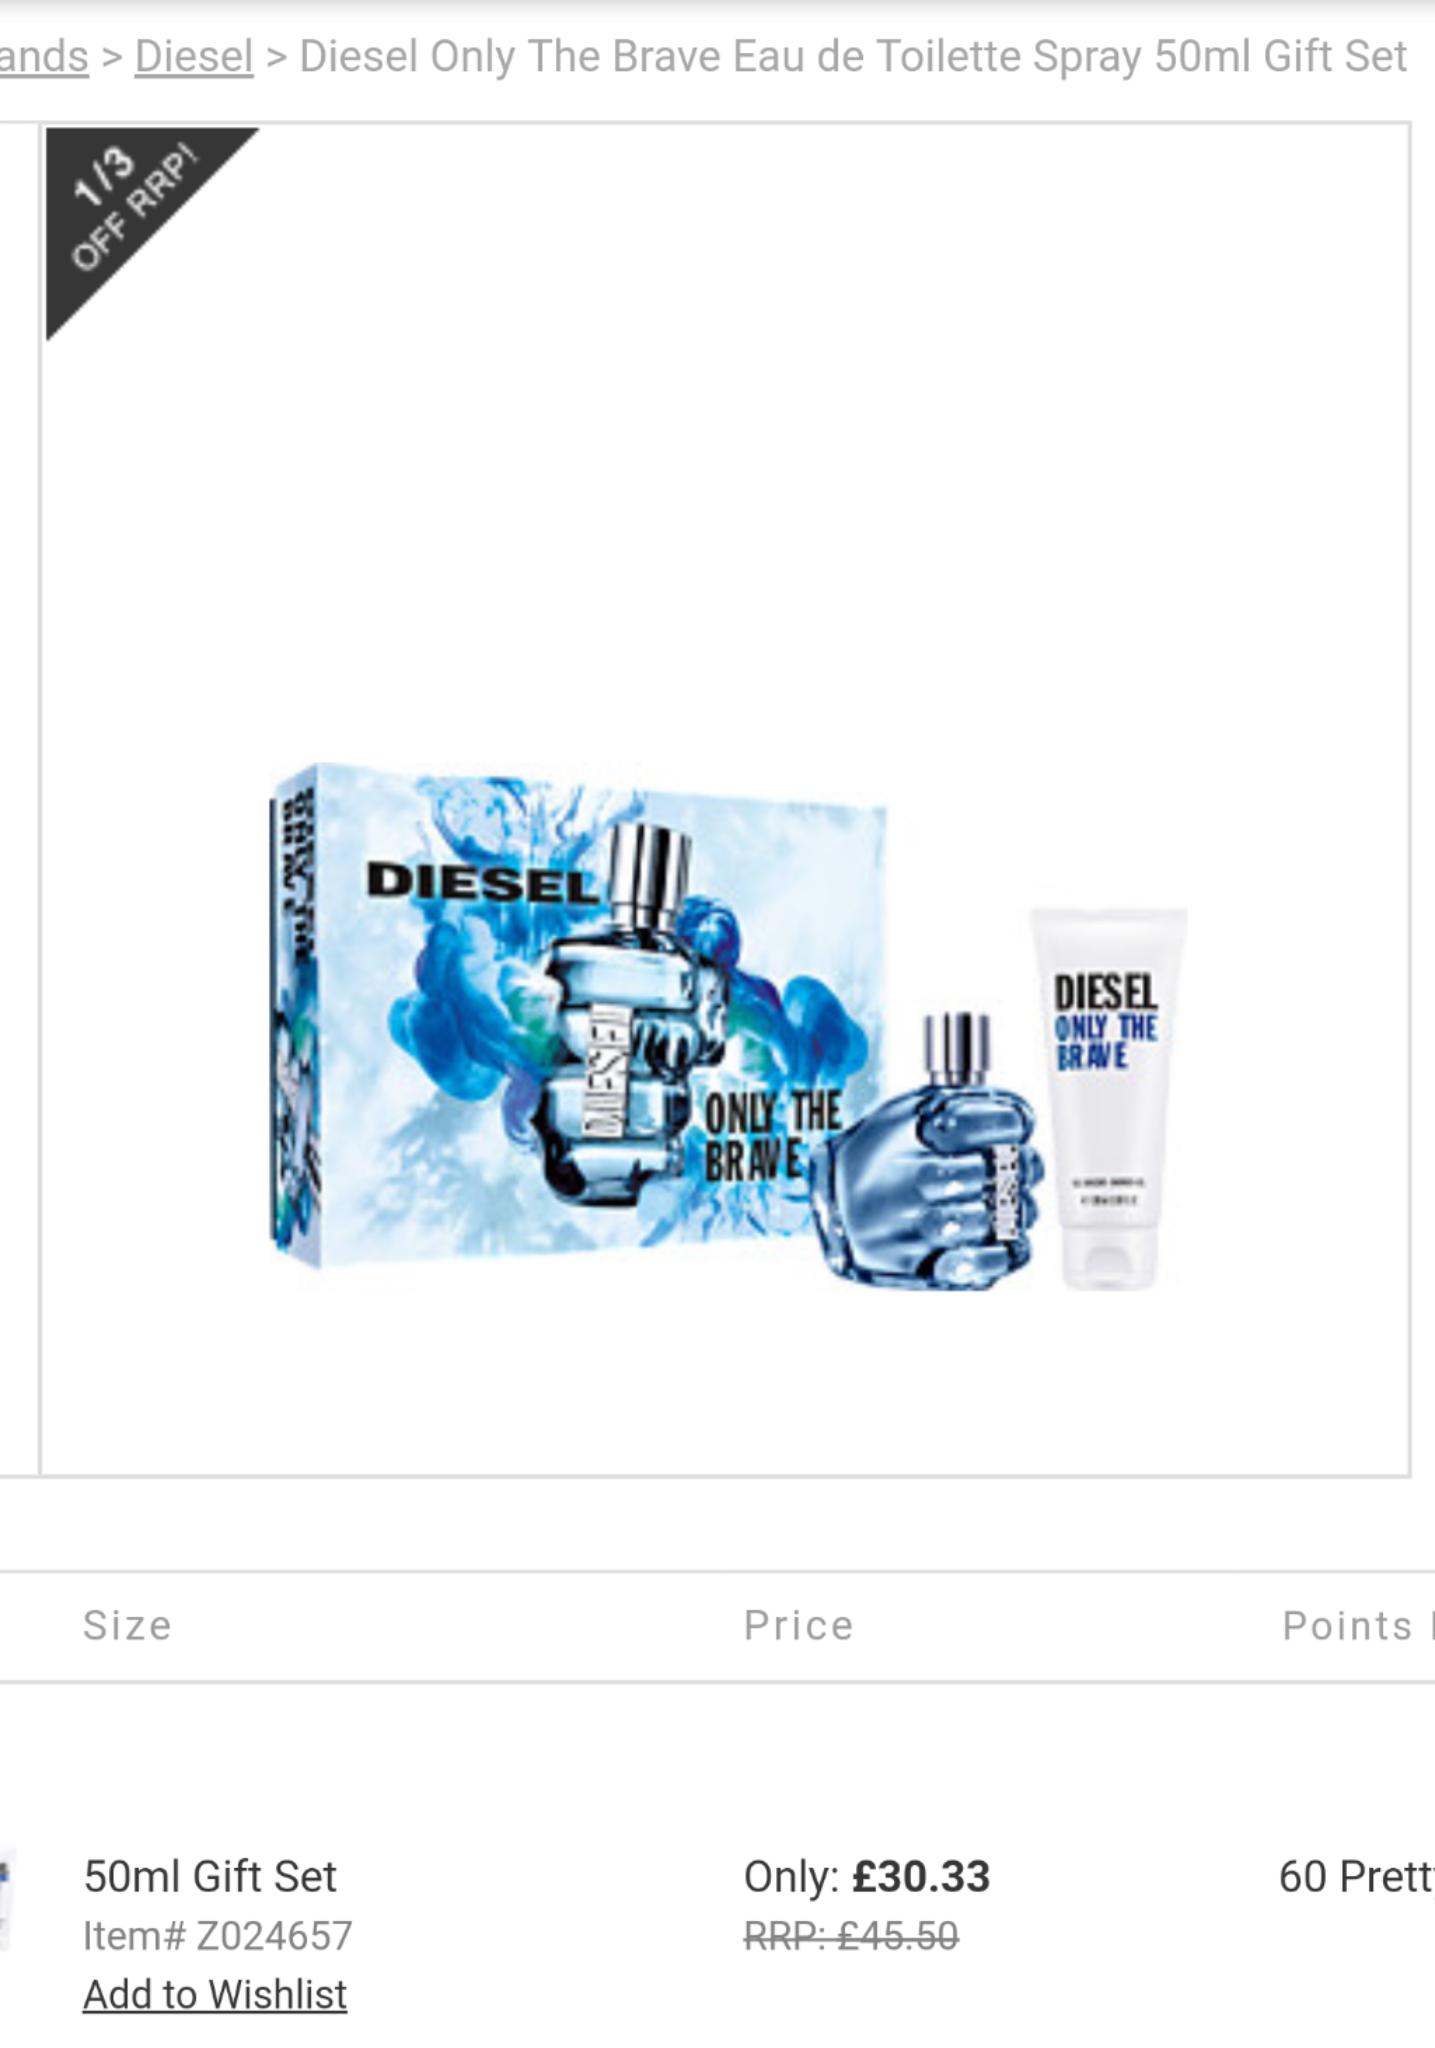 Diesel Only The Brave gift set @Escentual £30.33 delivered plus 7.87% topcashback